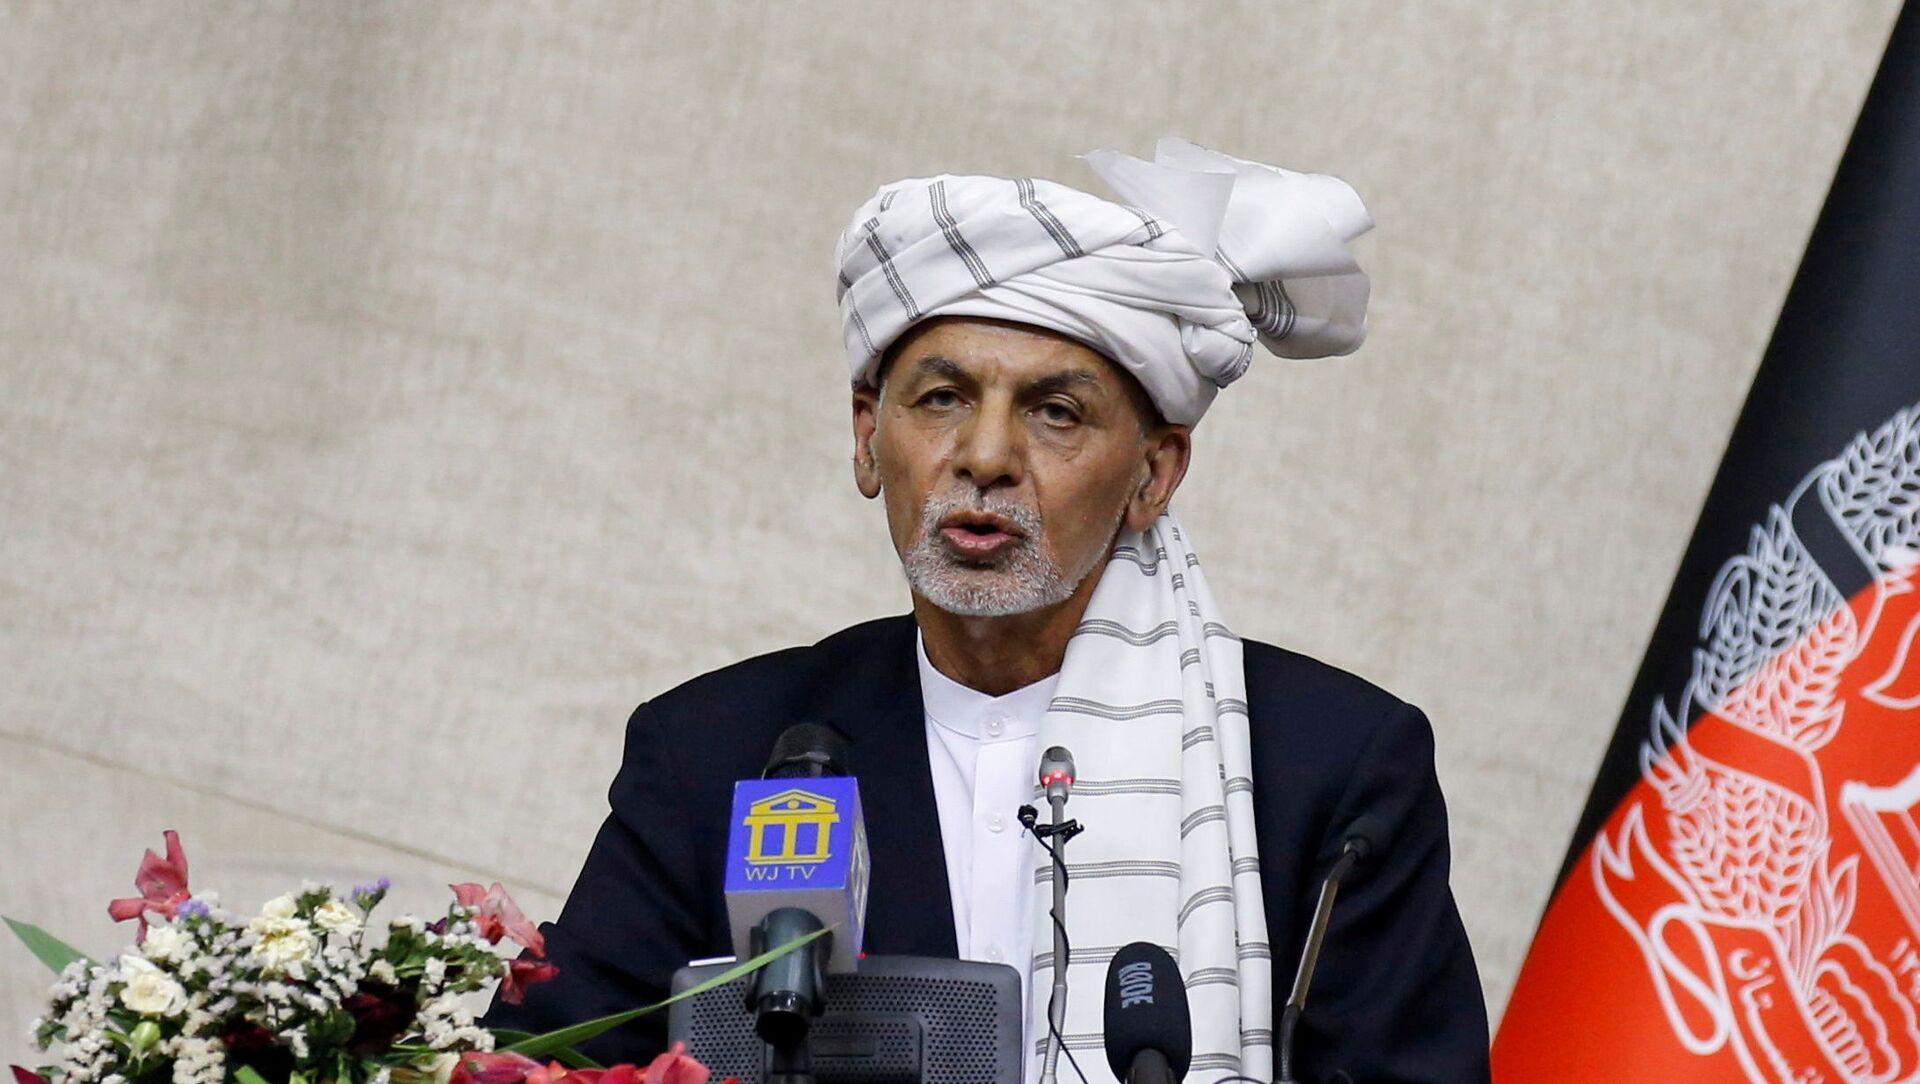 Afghan President Ashraf Ghani speaks at the parliament in Kabul, Afghanistan August 2, 2021 - Sputnik International, 1920, 16.08.2021